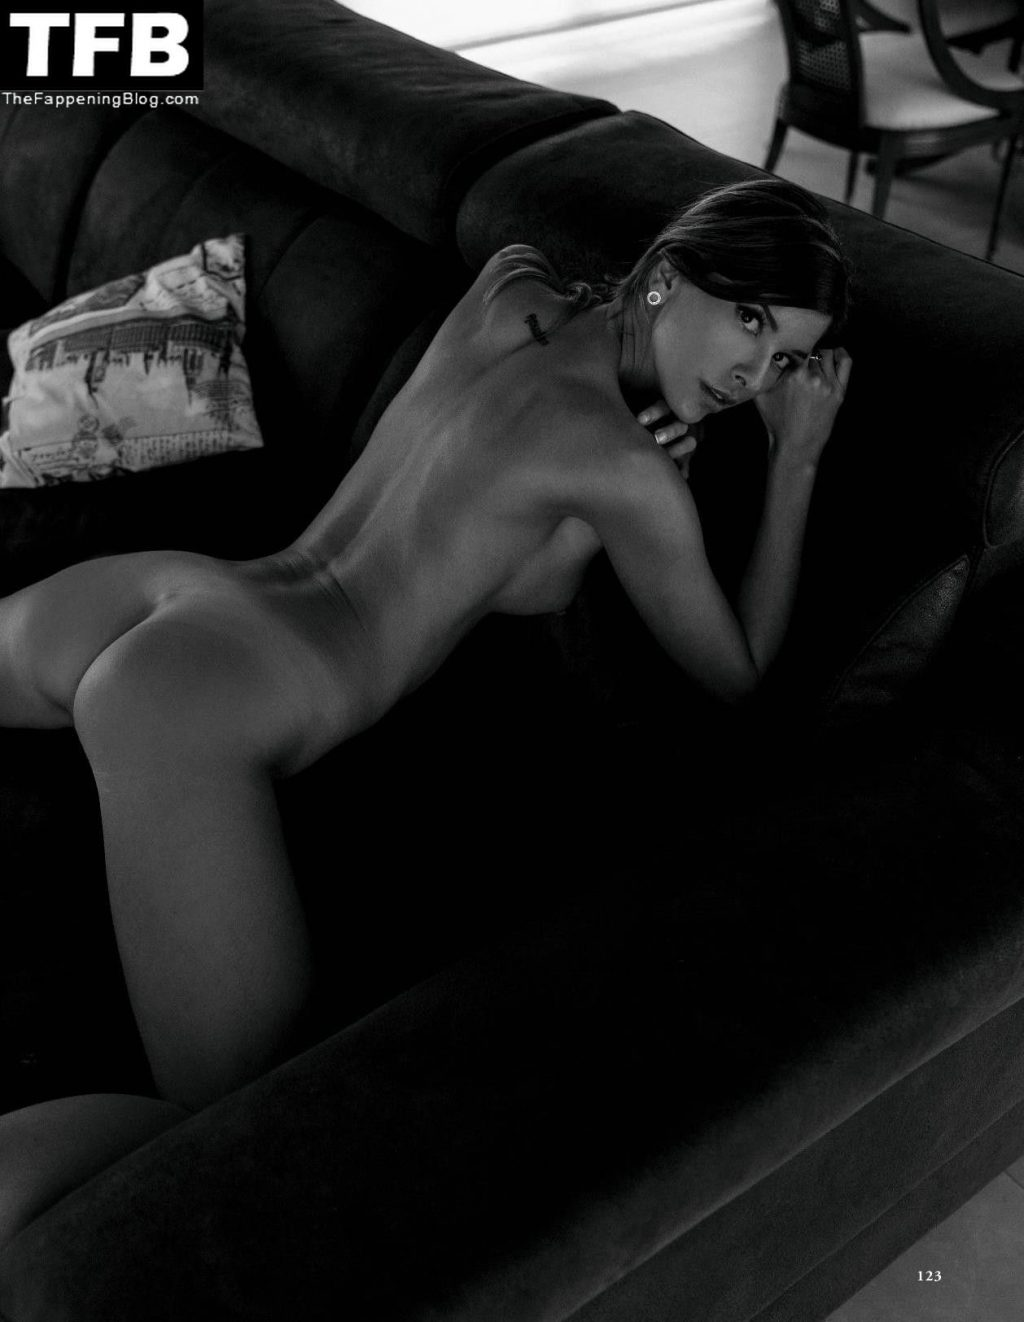 Sara Perez Poses Nude For Playboy (8 Photos)